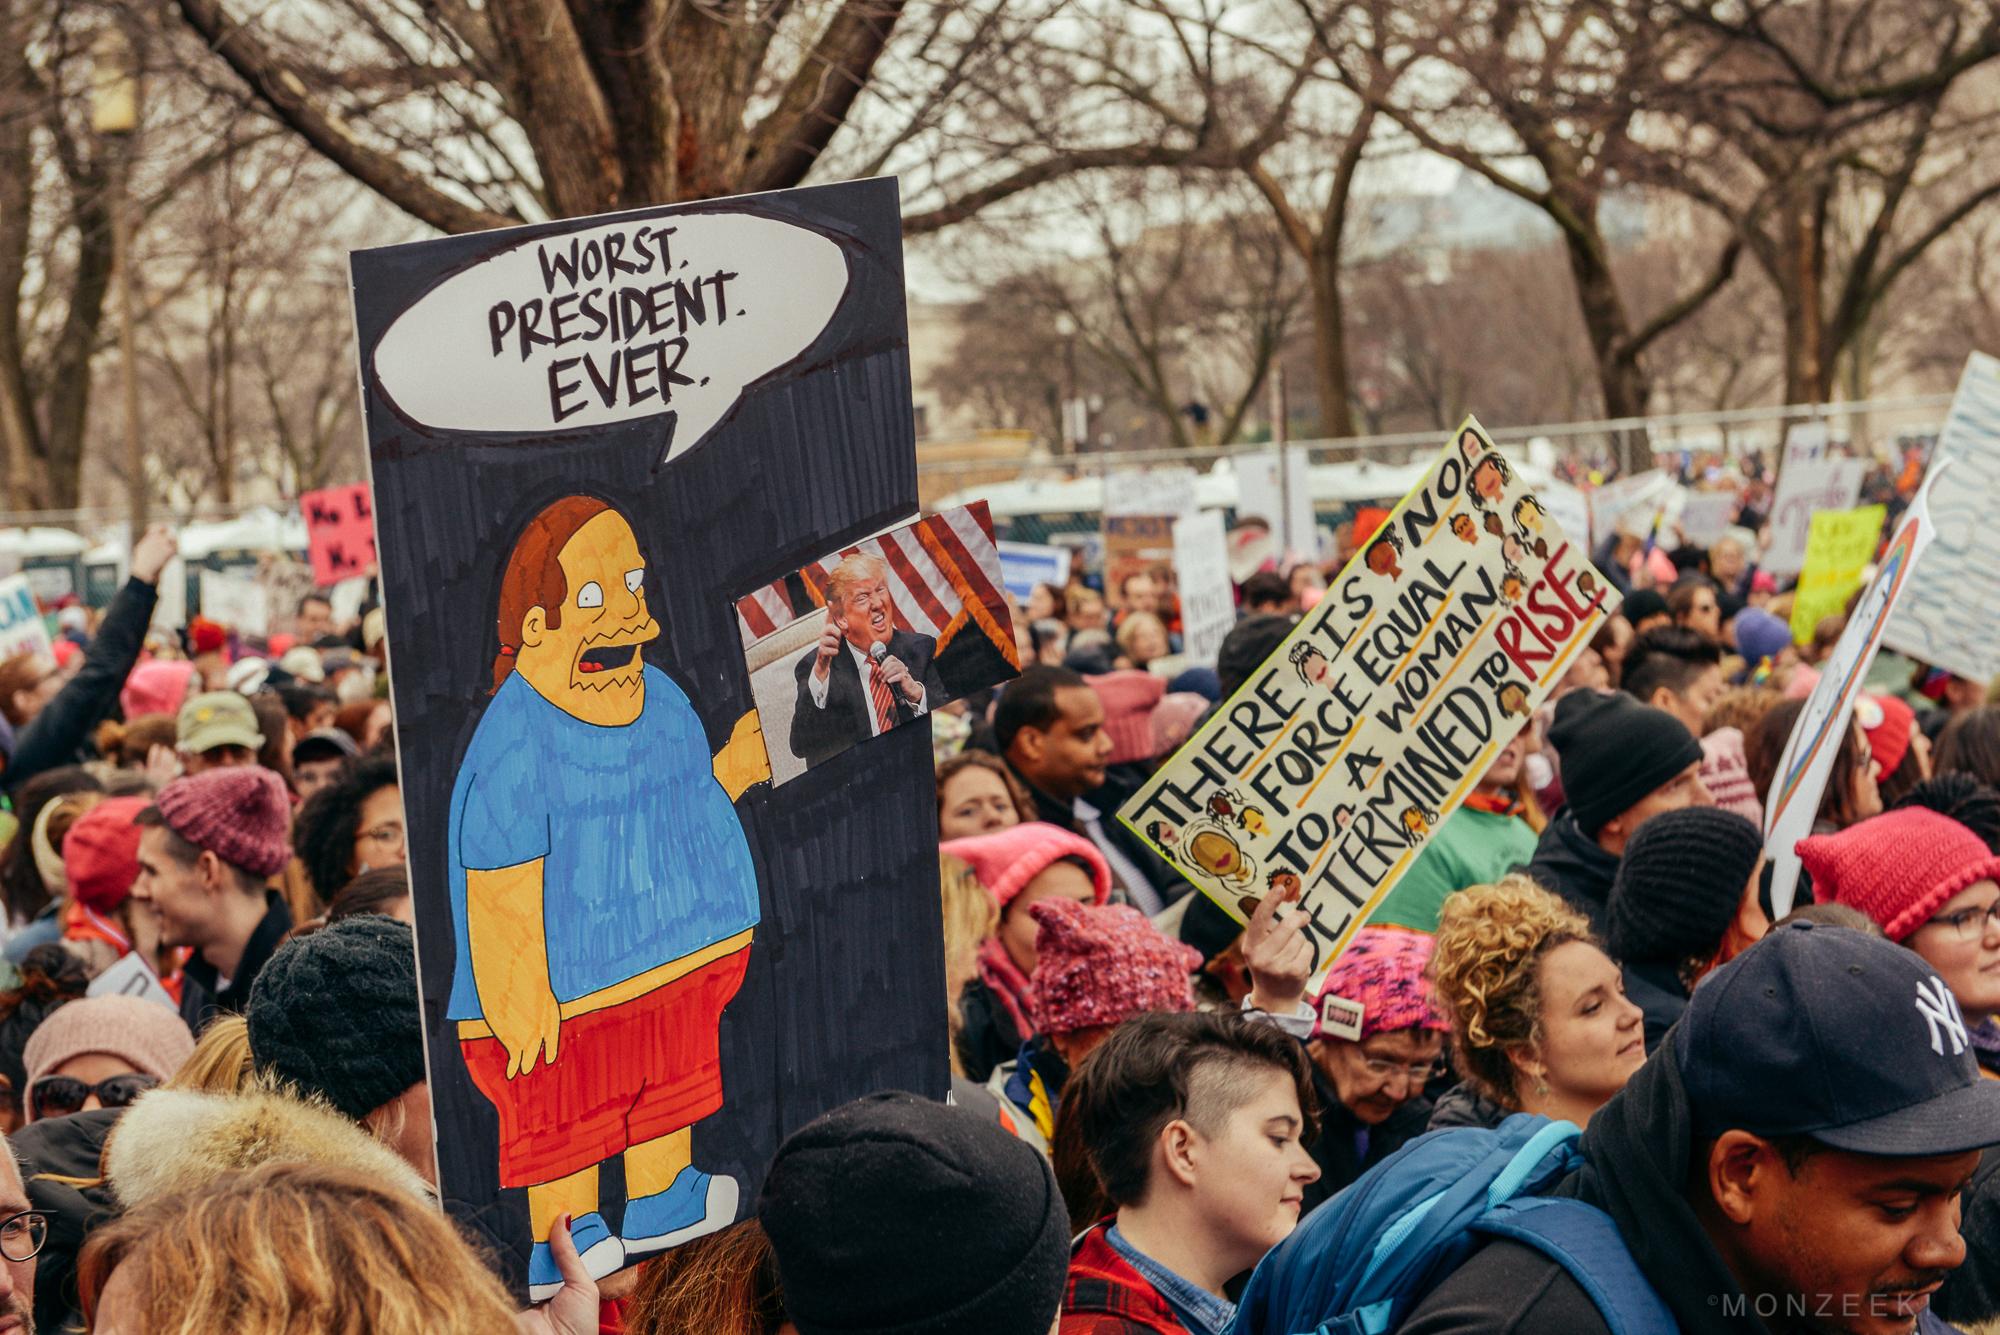 20170121-womens-march-dc-2666.jpg